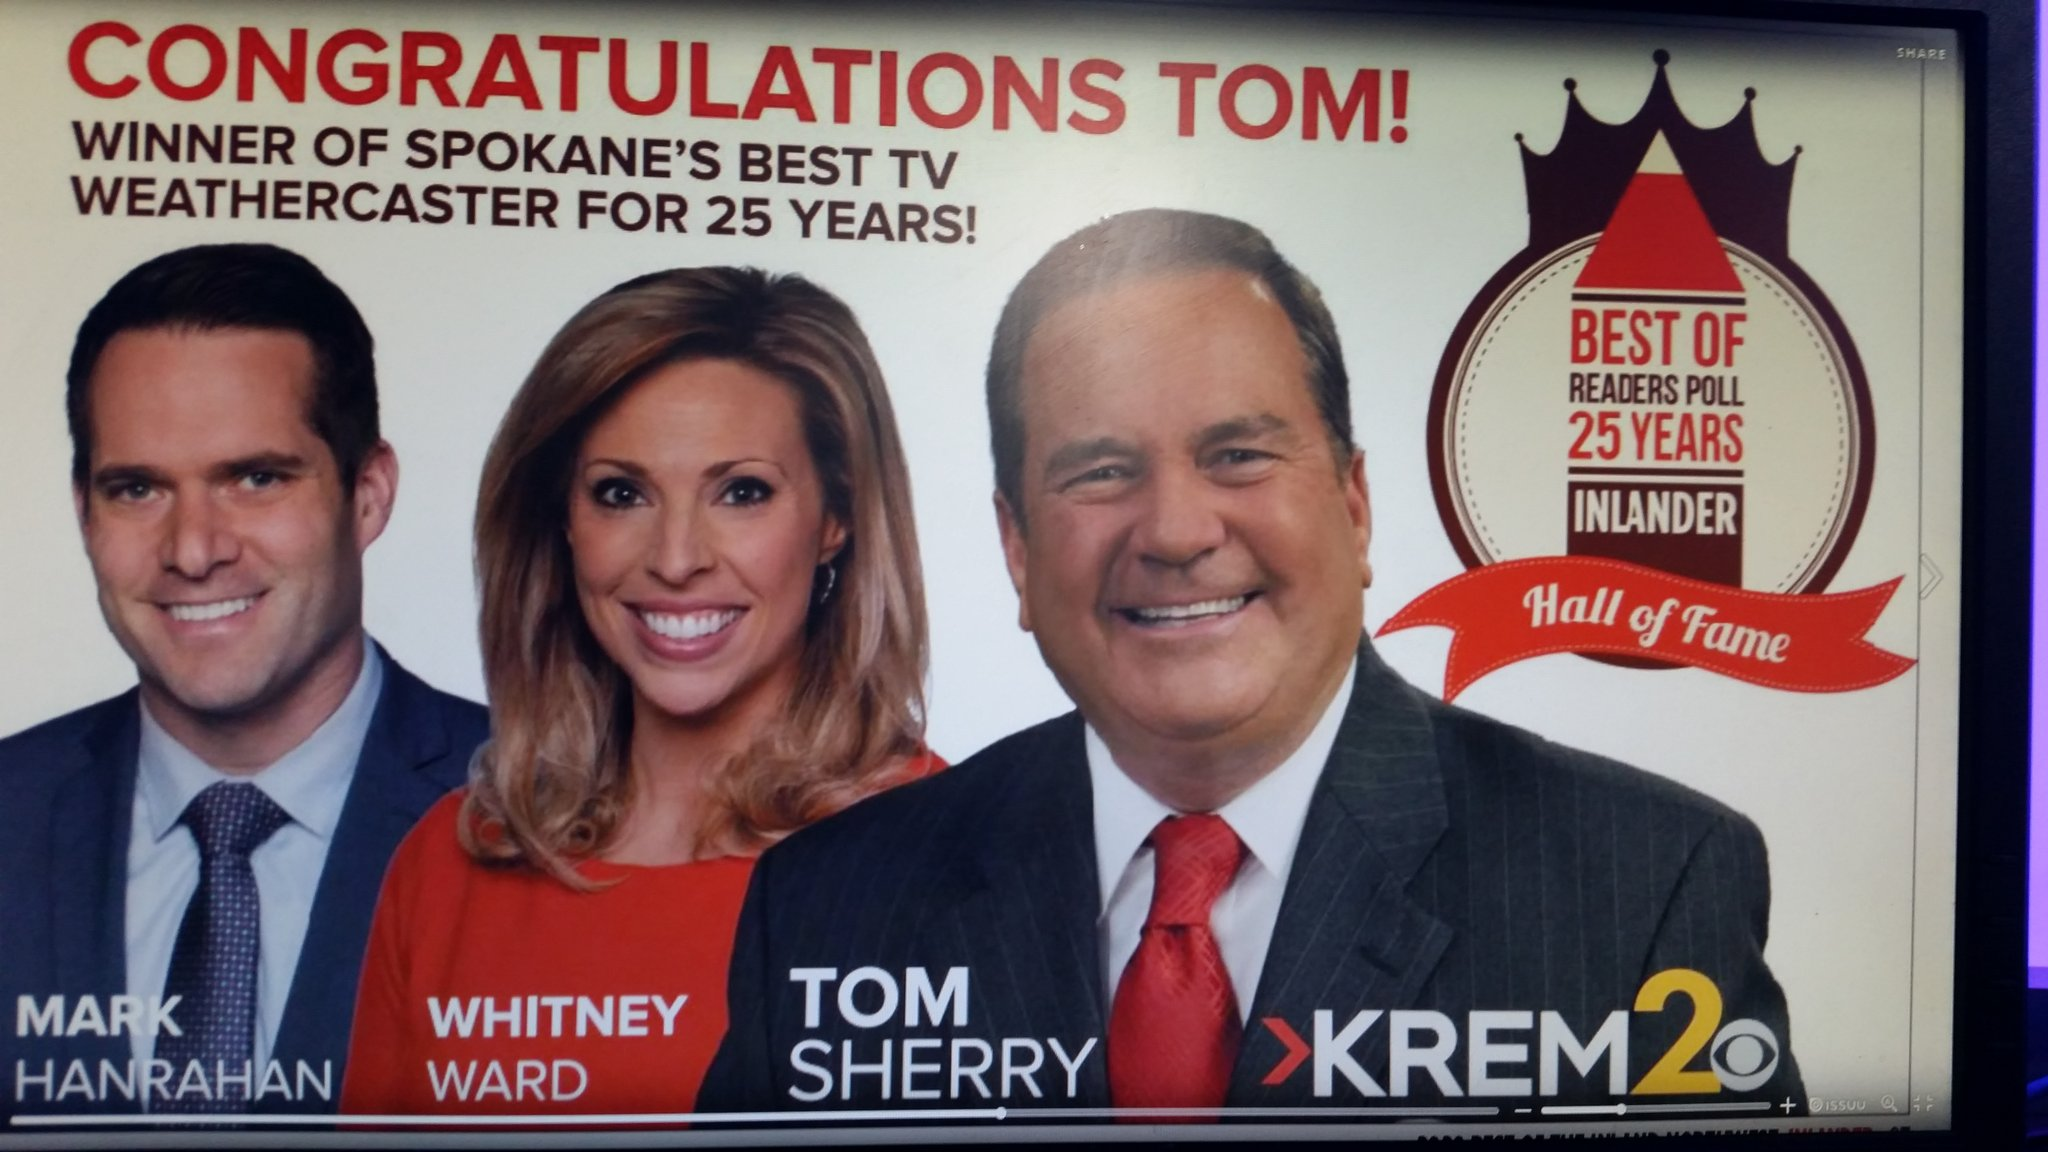 Tom Sherry on Twitter: